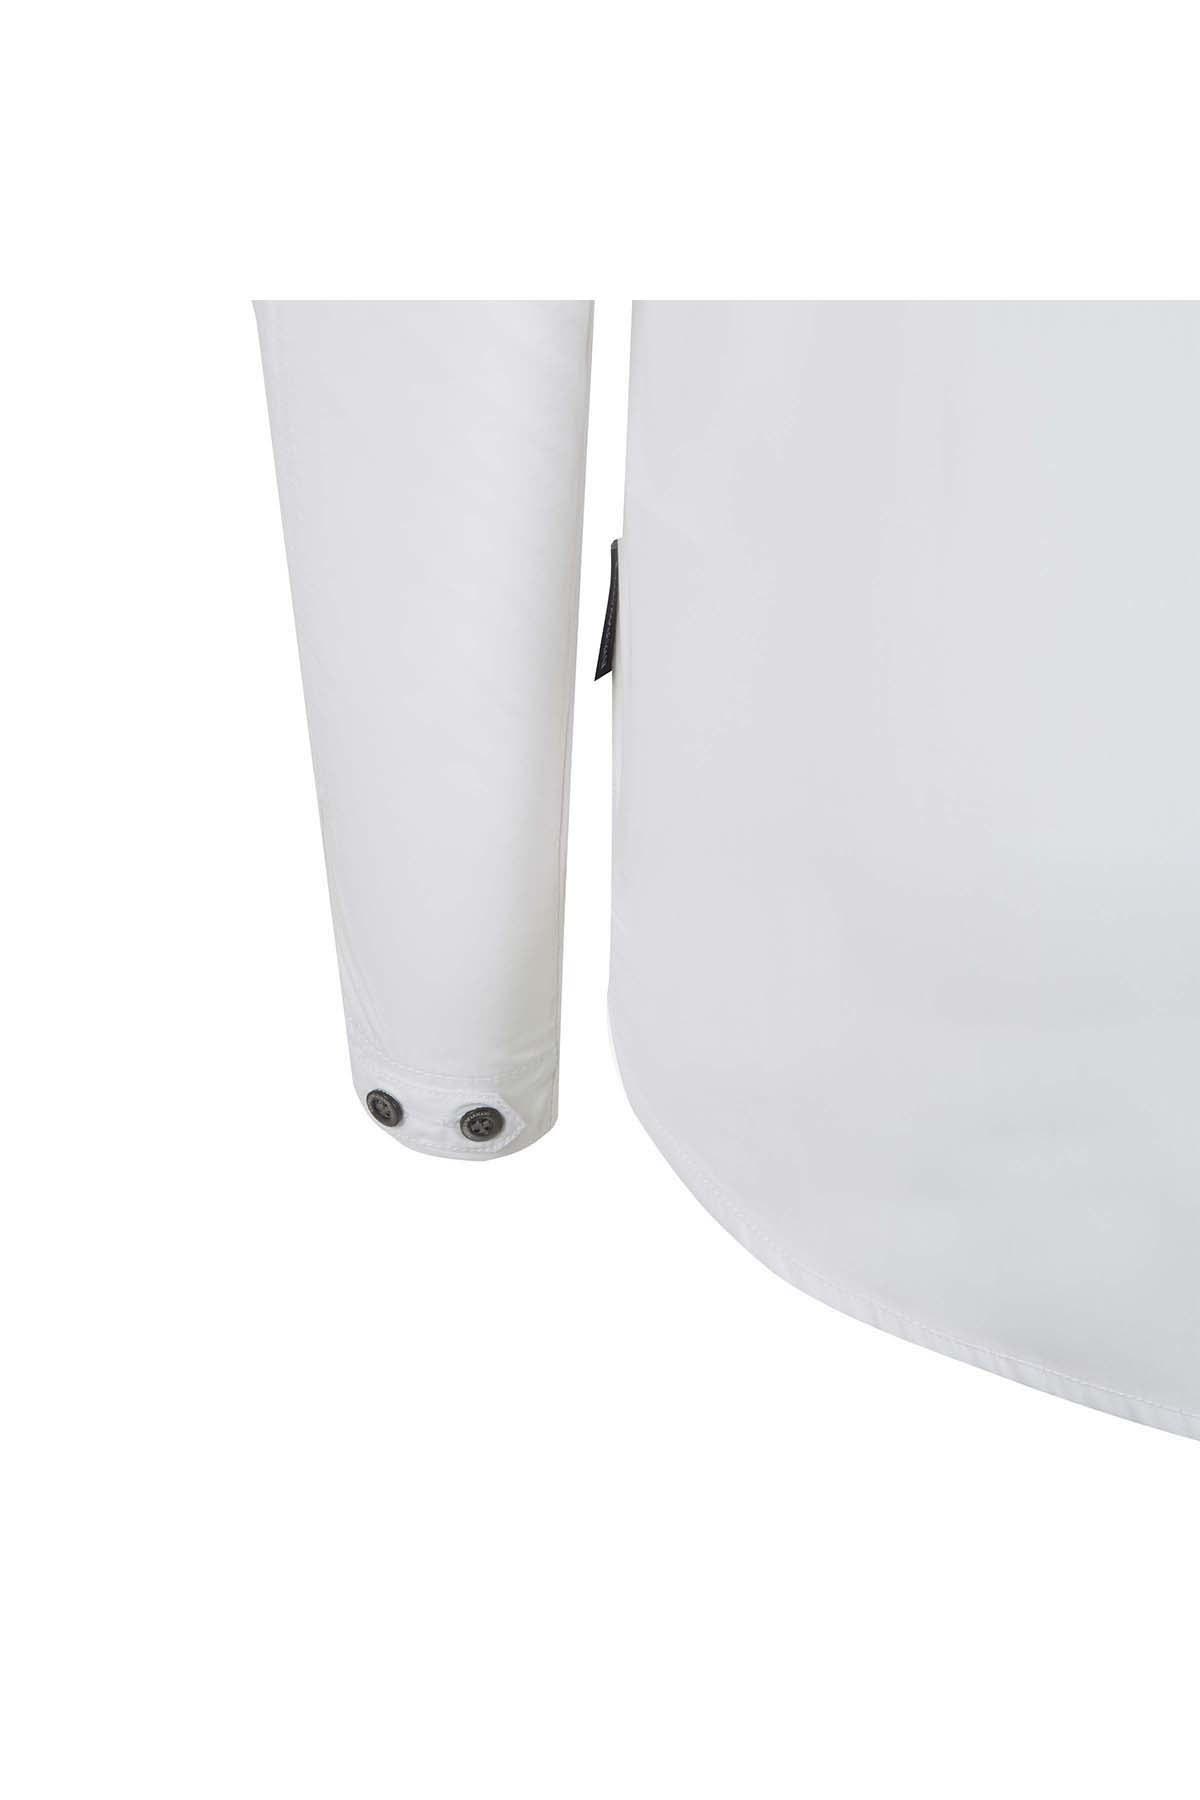 EMPORIO ARMANI Erkek Gömlek 3Z1C61 1NSCZ0 100 BEYAZ